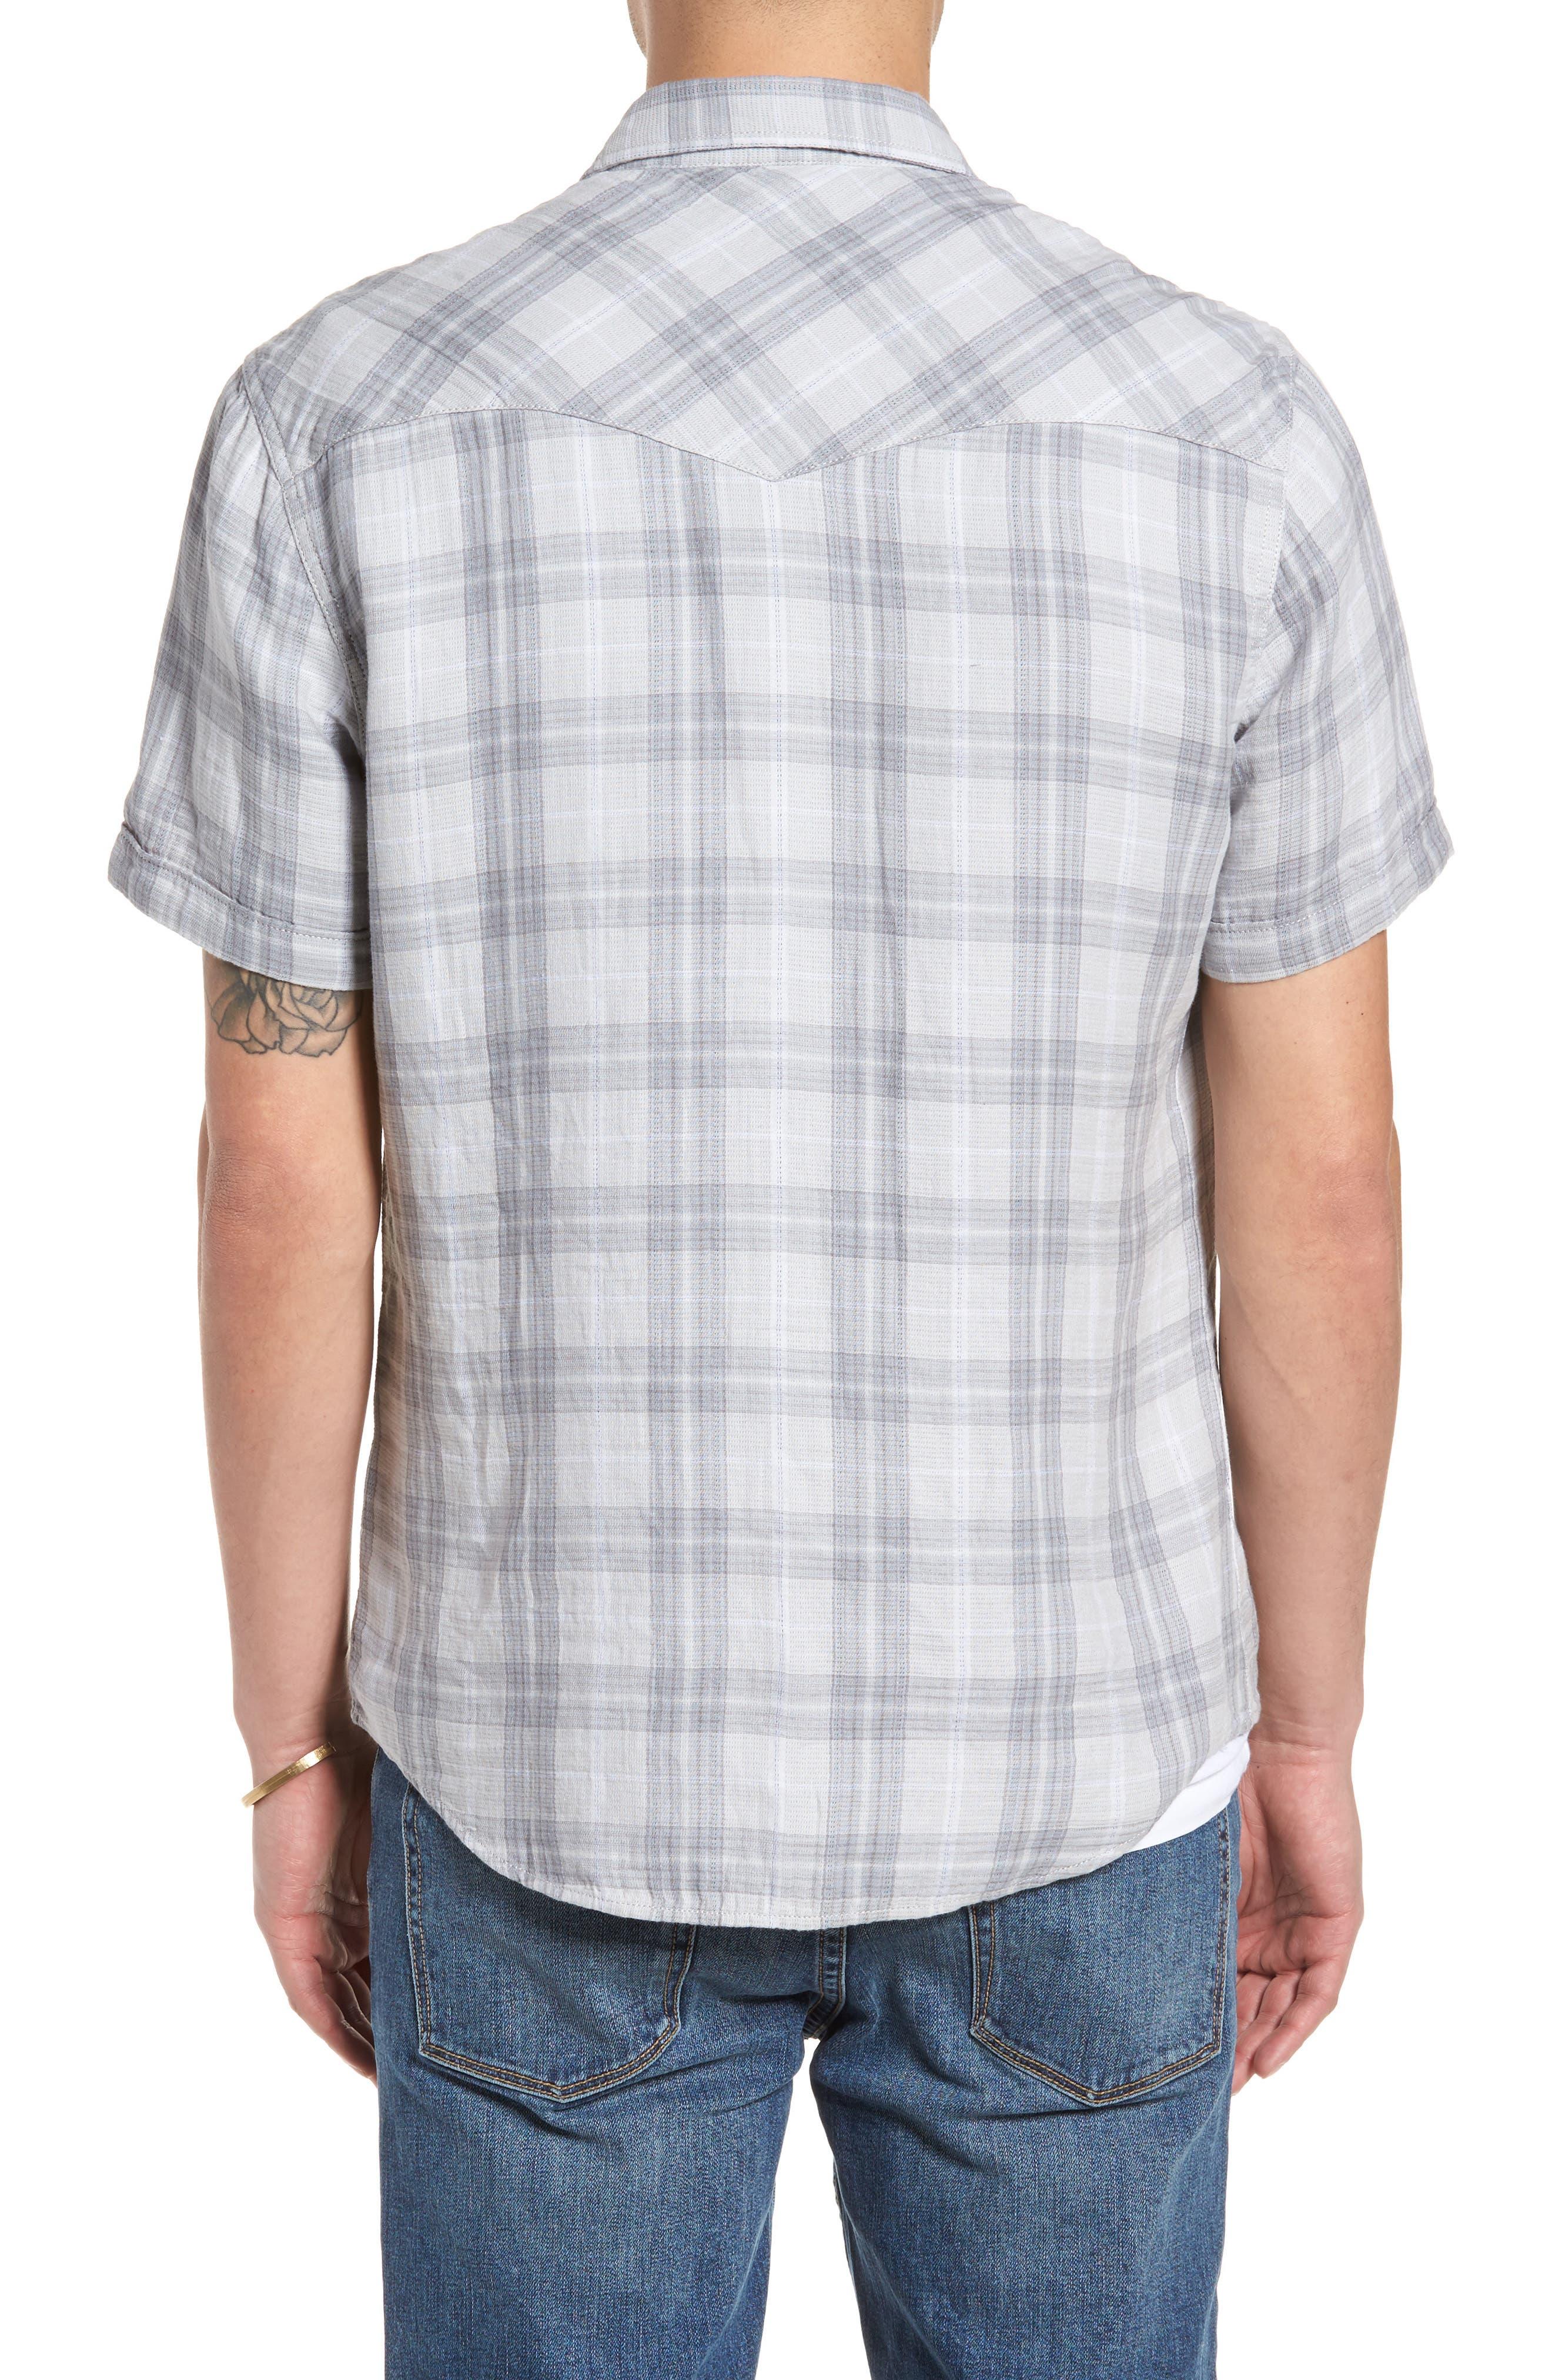 Plaid Short Sleeve Sport Shirt,                             Alternate thumbnail 2, color,                             Grey Sleet Plaid Duofold